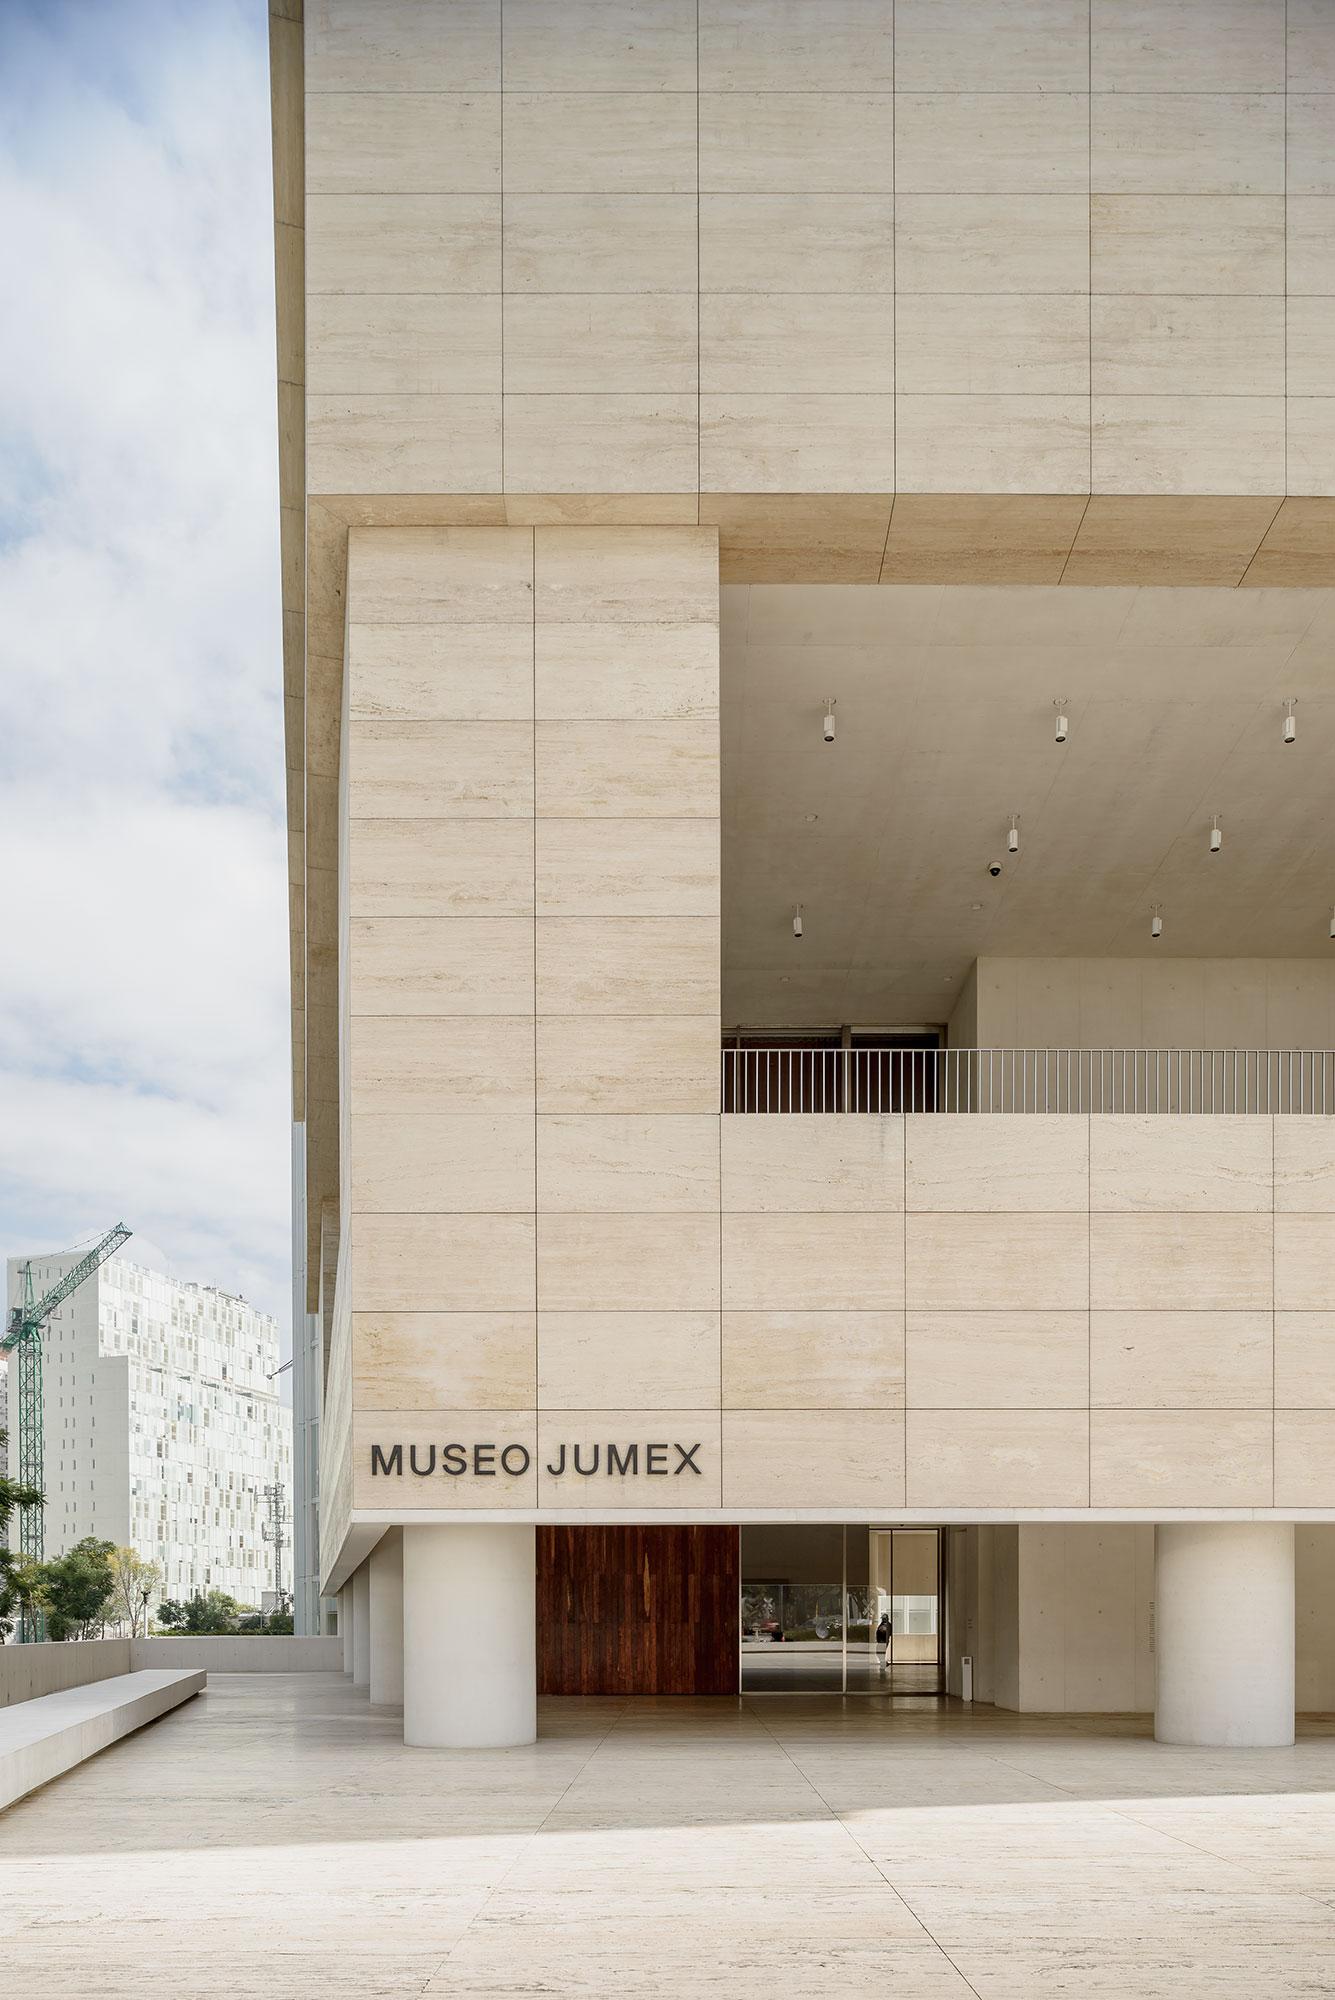 Museo Jumex